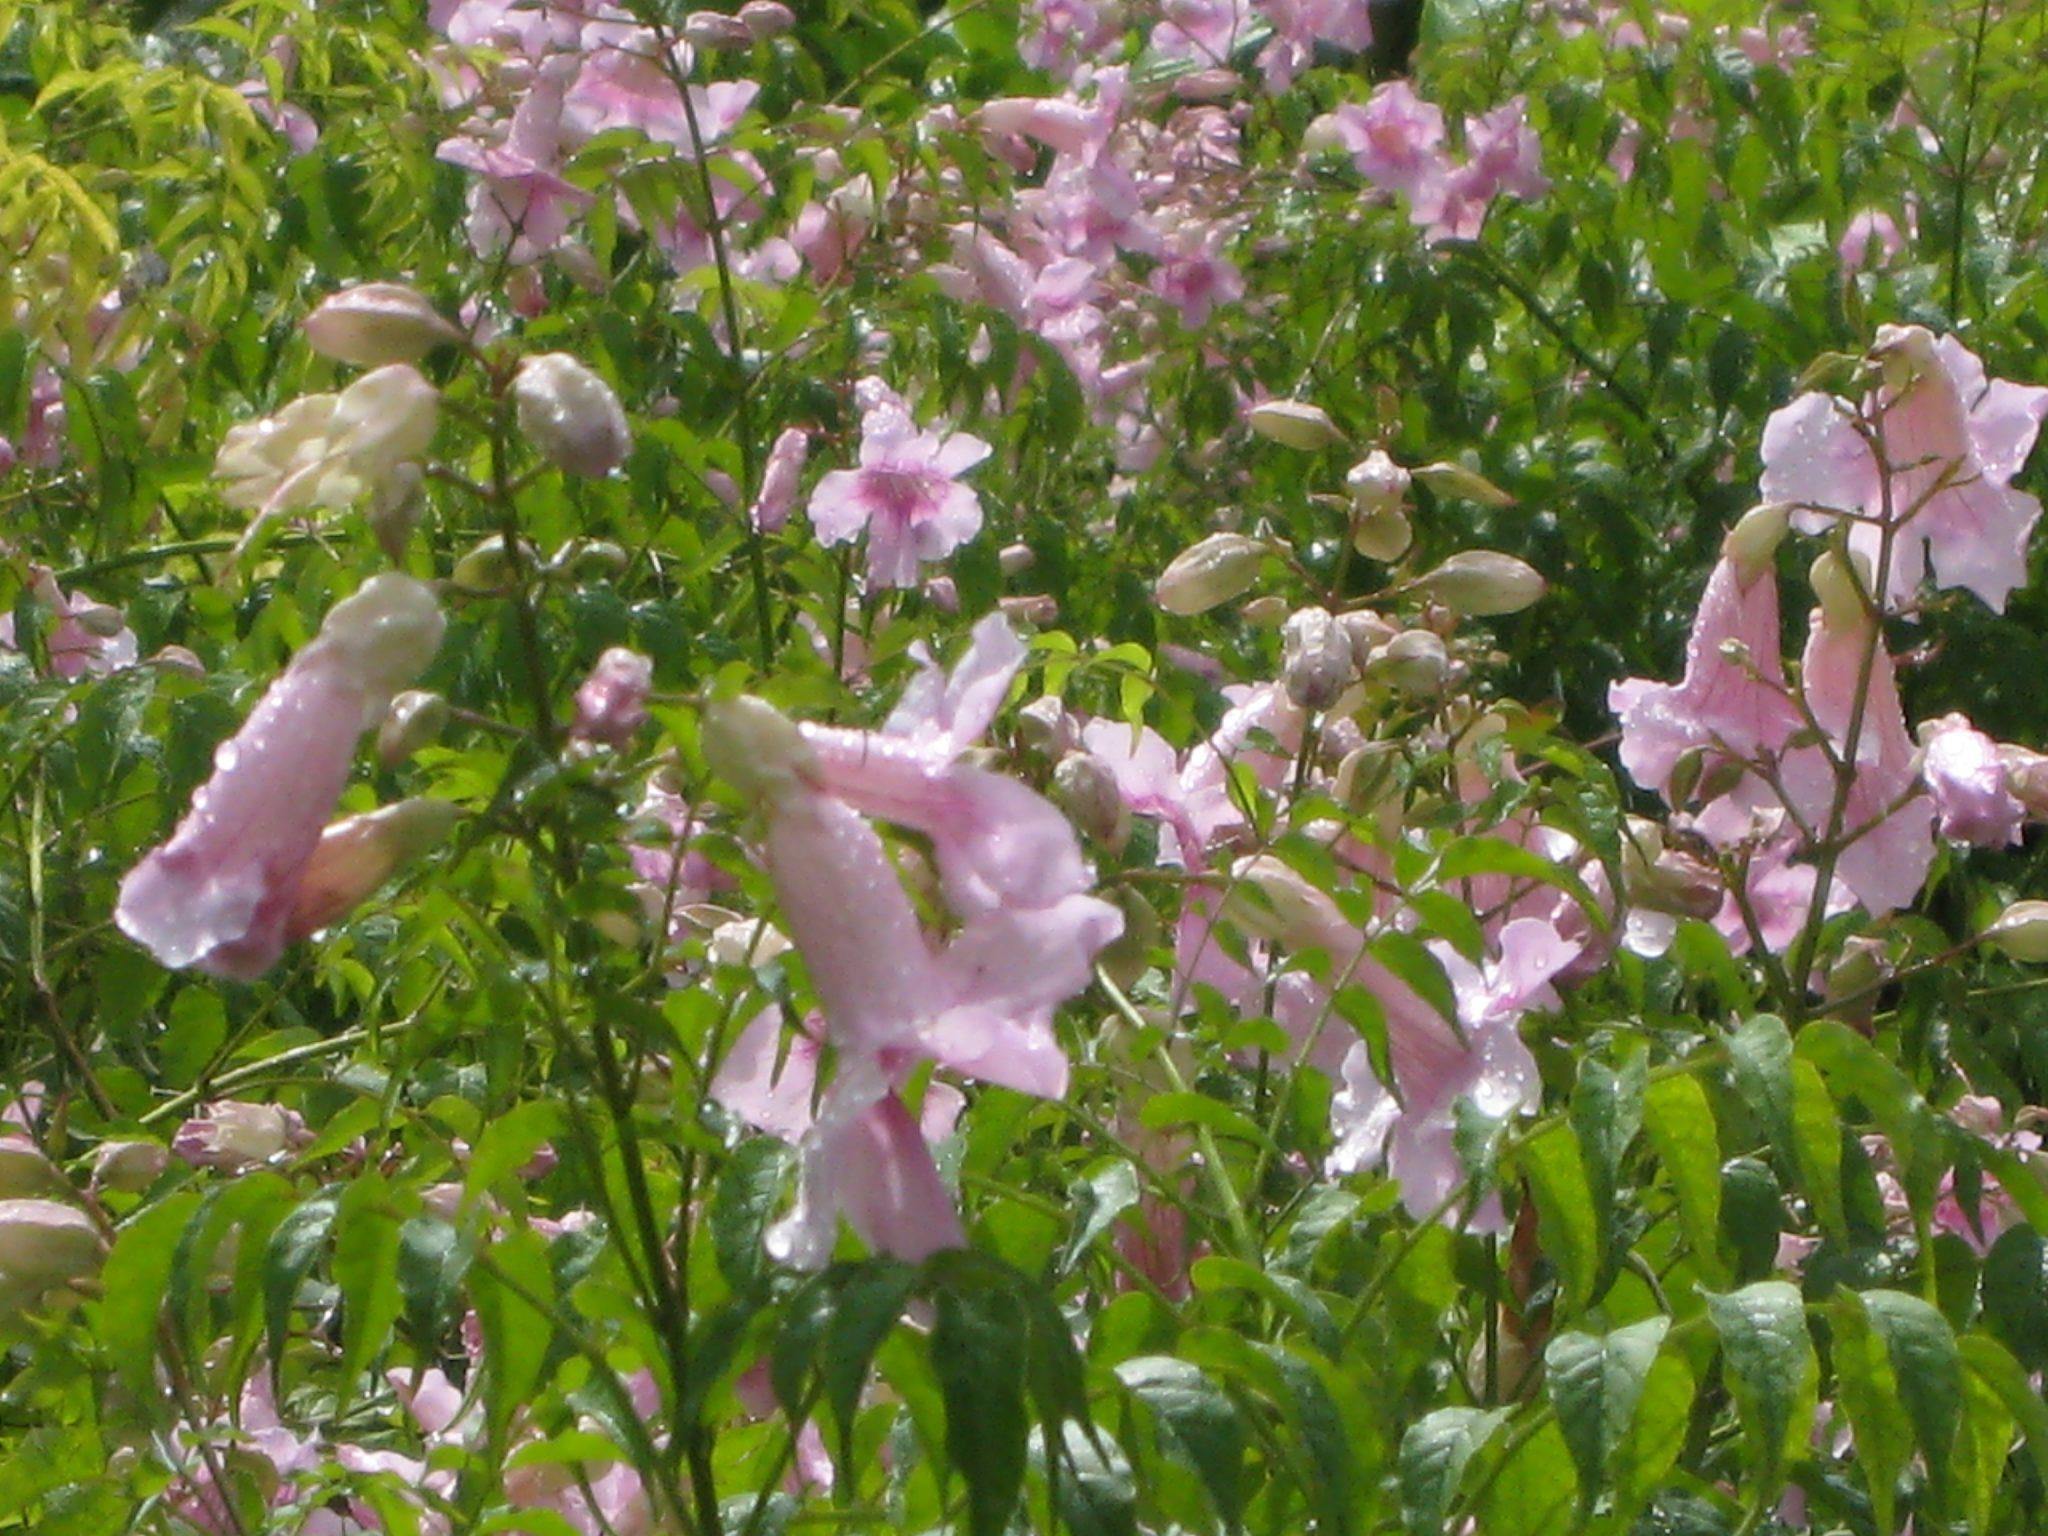 Podranea ricasoliana pink trumpet vine richard lyons nursery inc podranea ricasoliana pink trumpet vine mightylinksfo